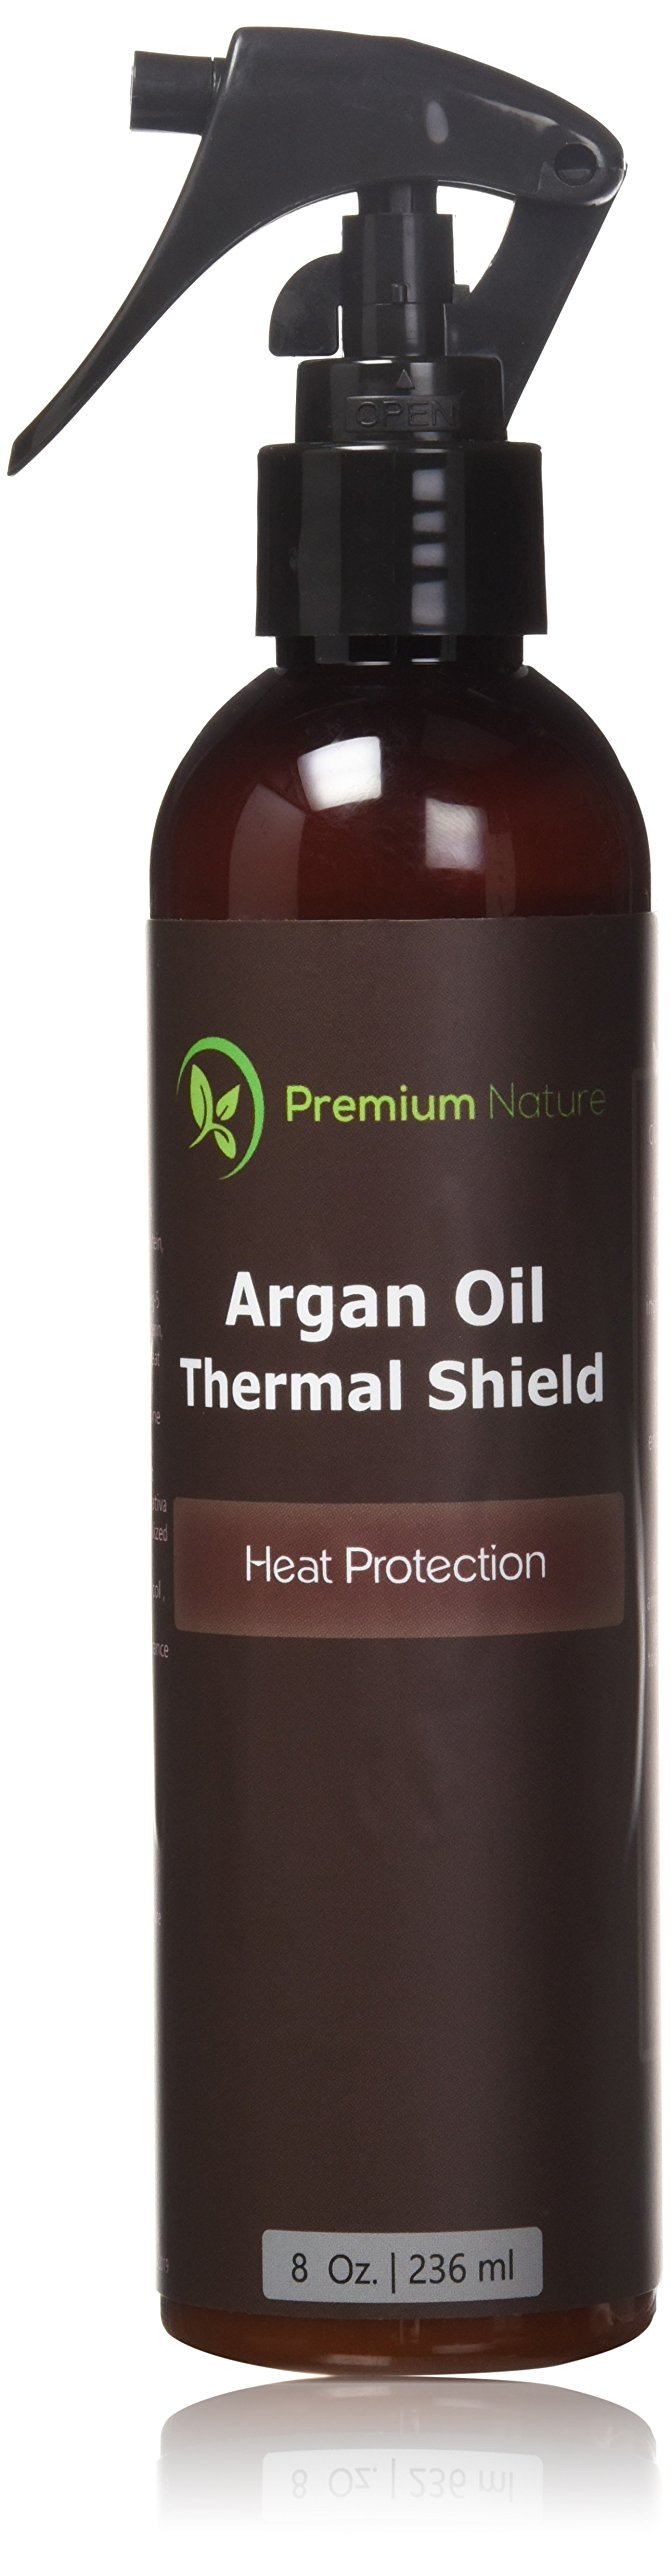 argan heat flat iron instructions